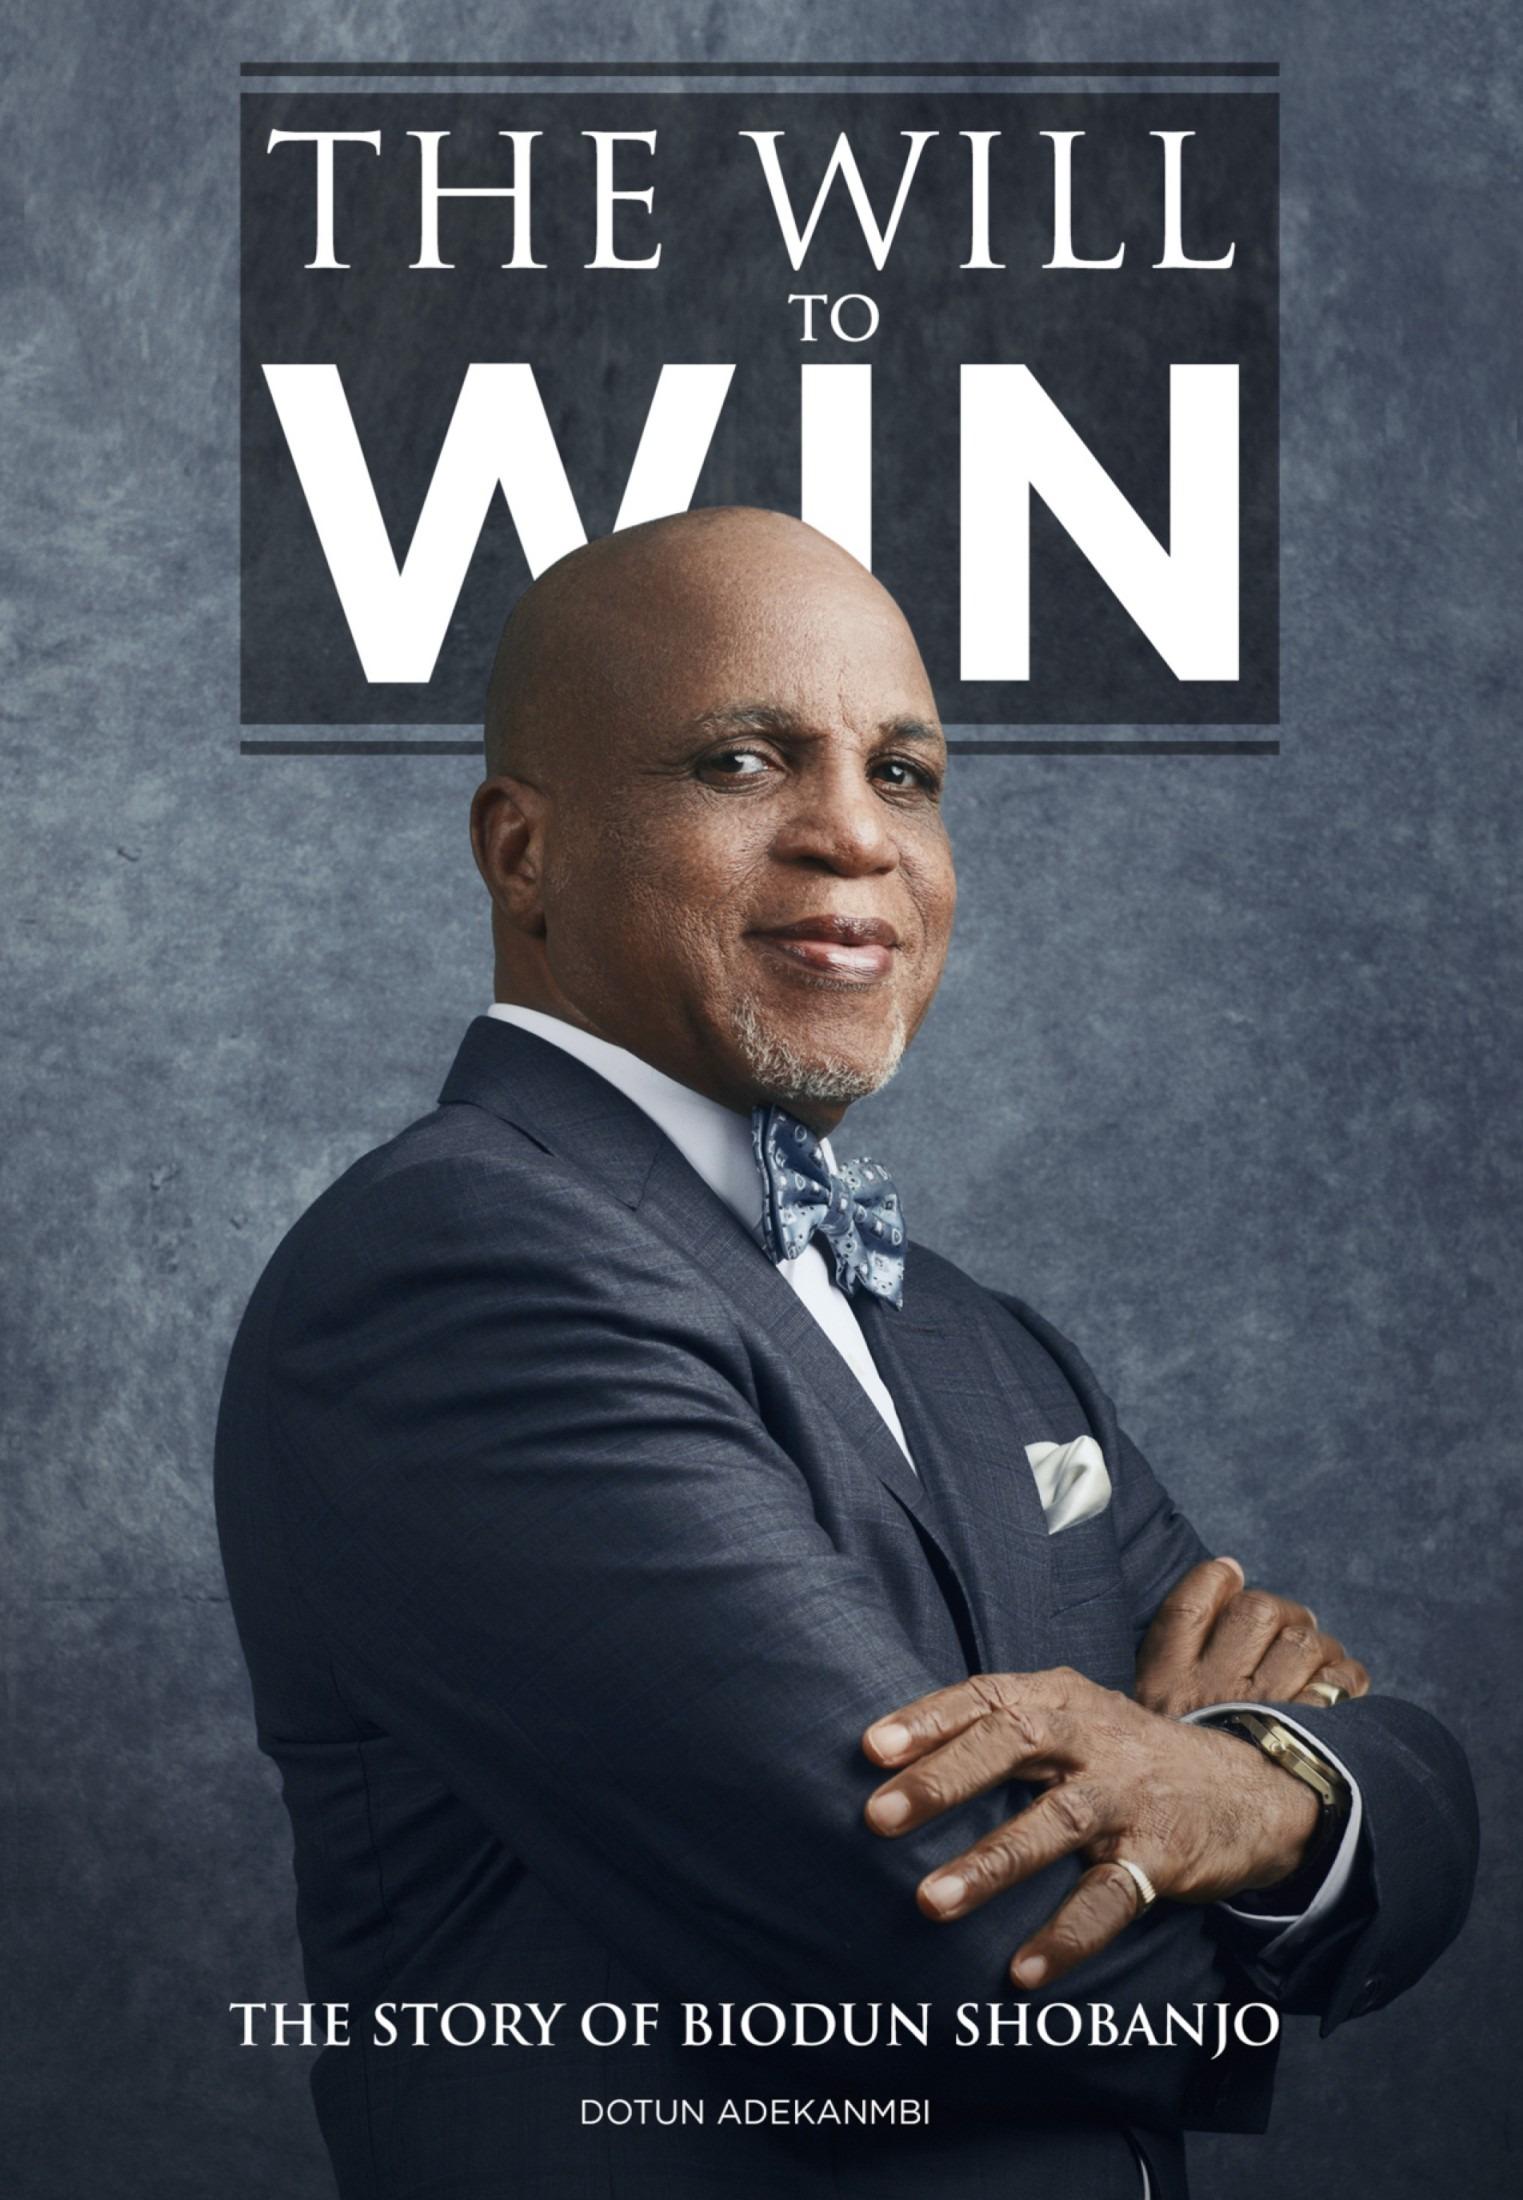 The Will to Win: The Story of Biodun Shobanjo